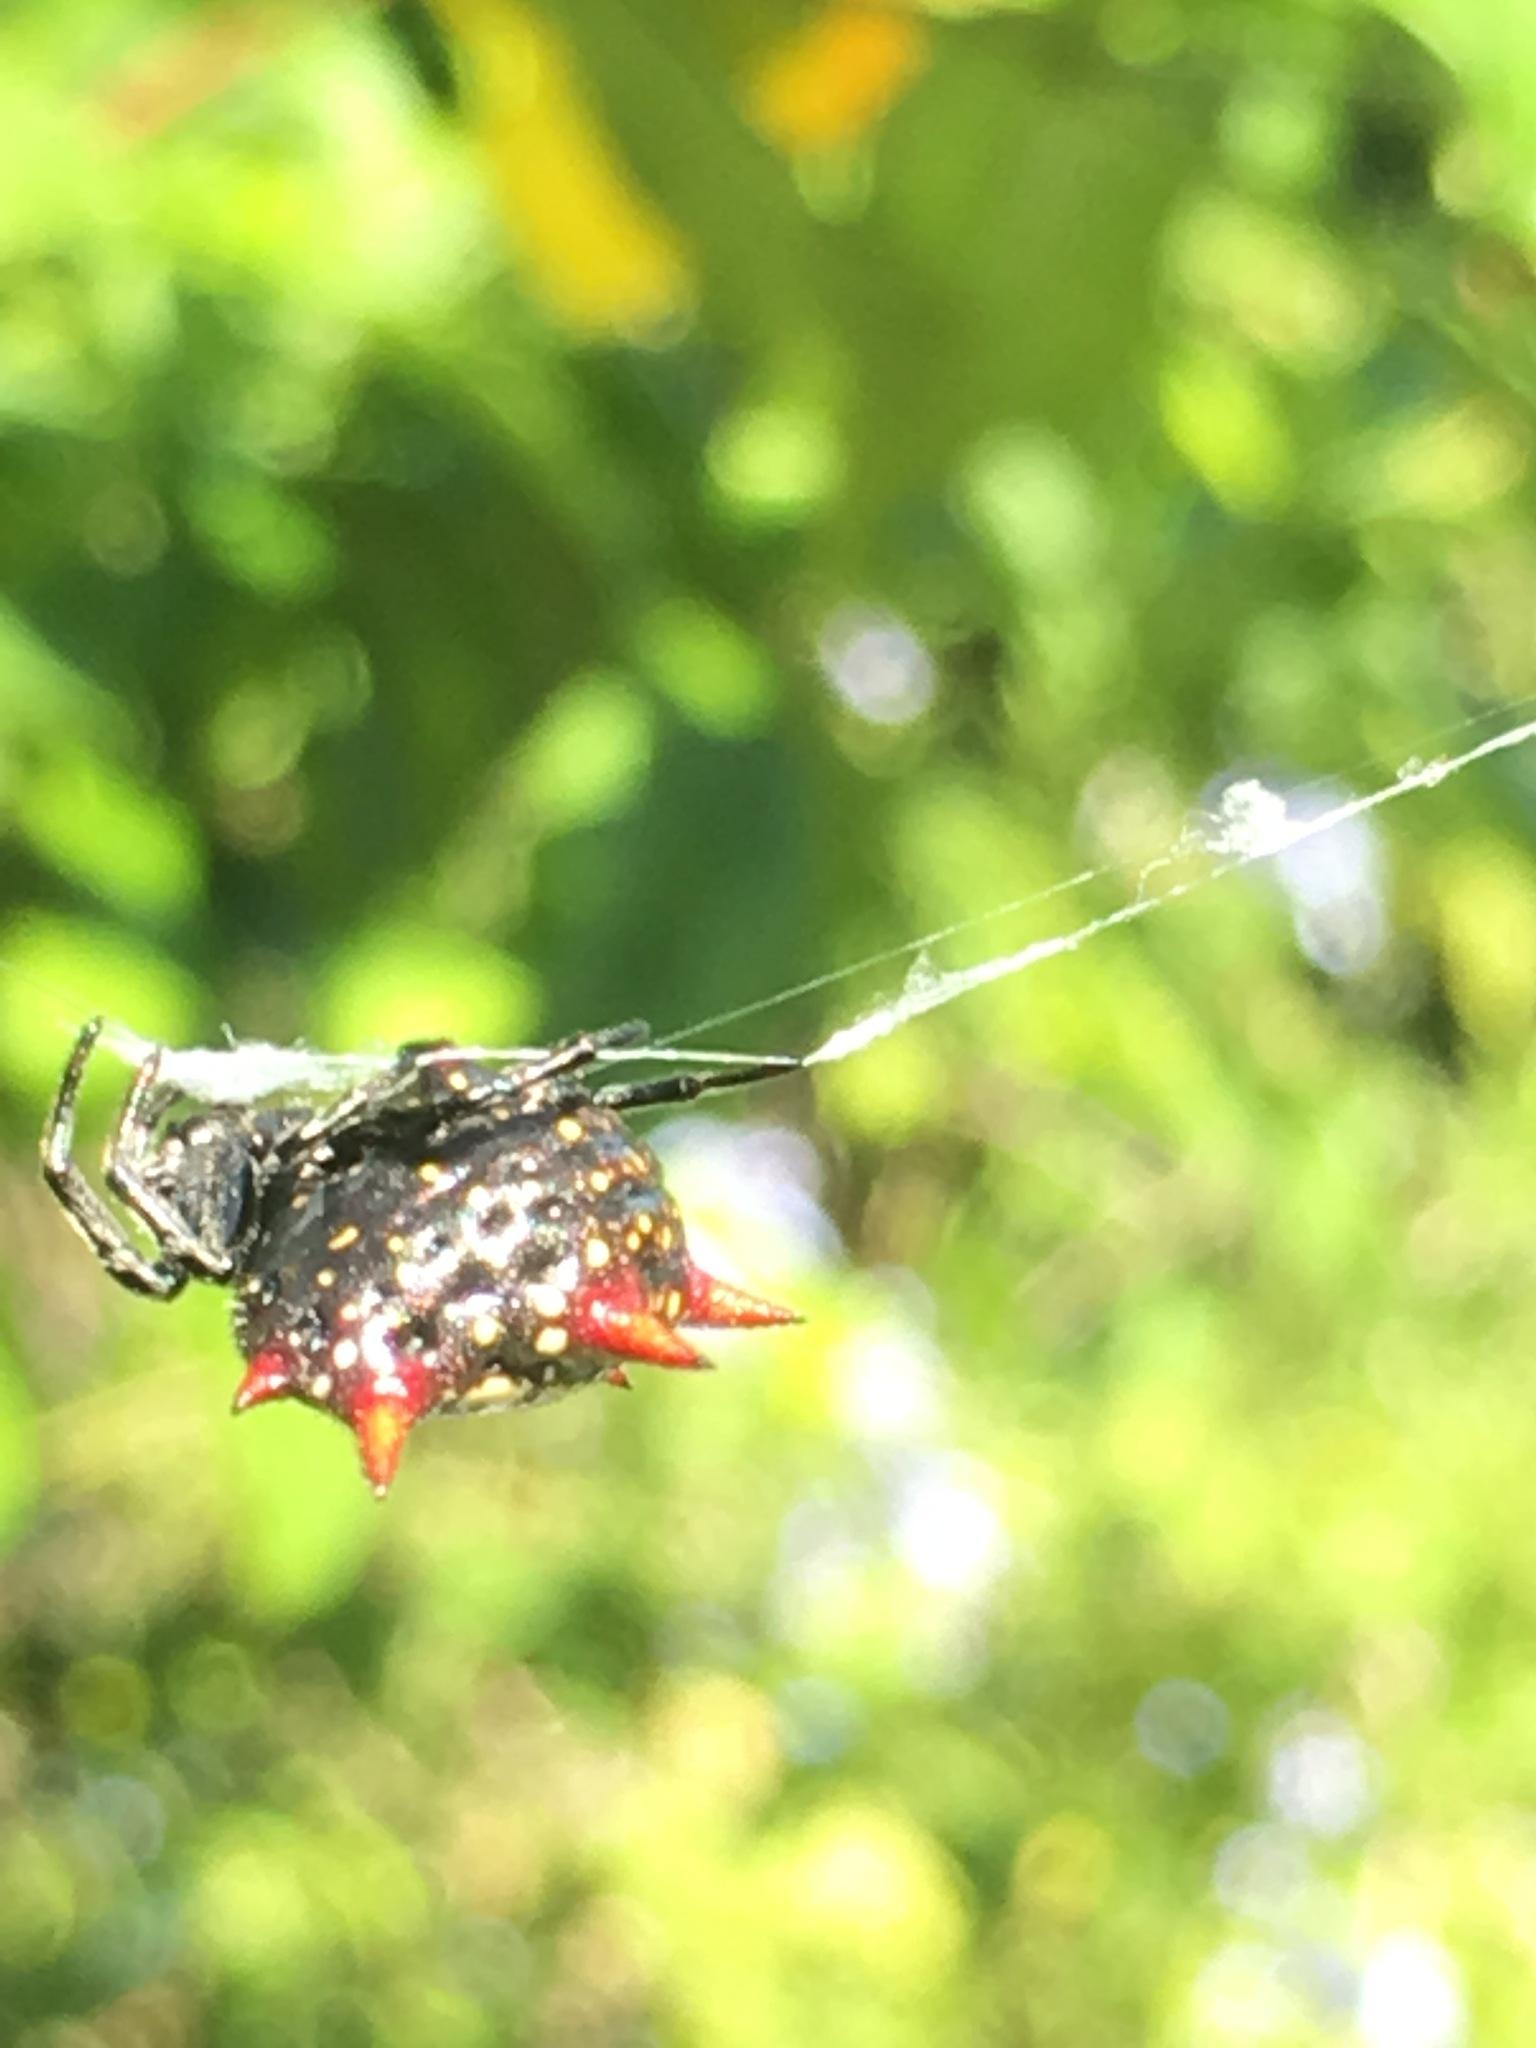 Spiny orb weaver upside down  by pamela.kanarr